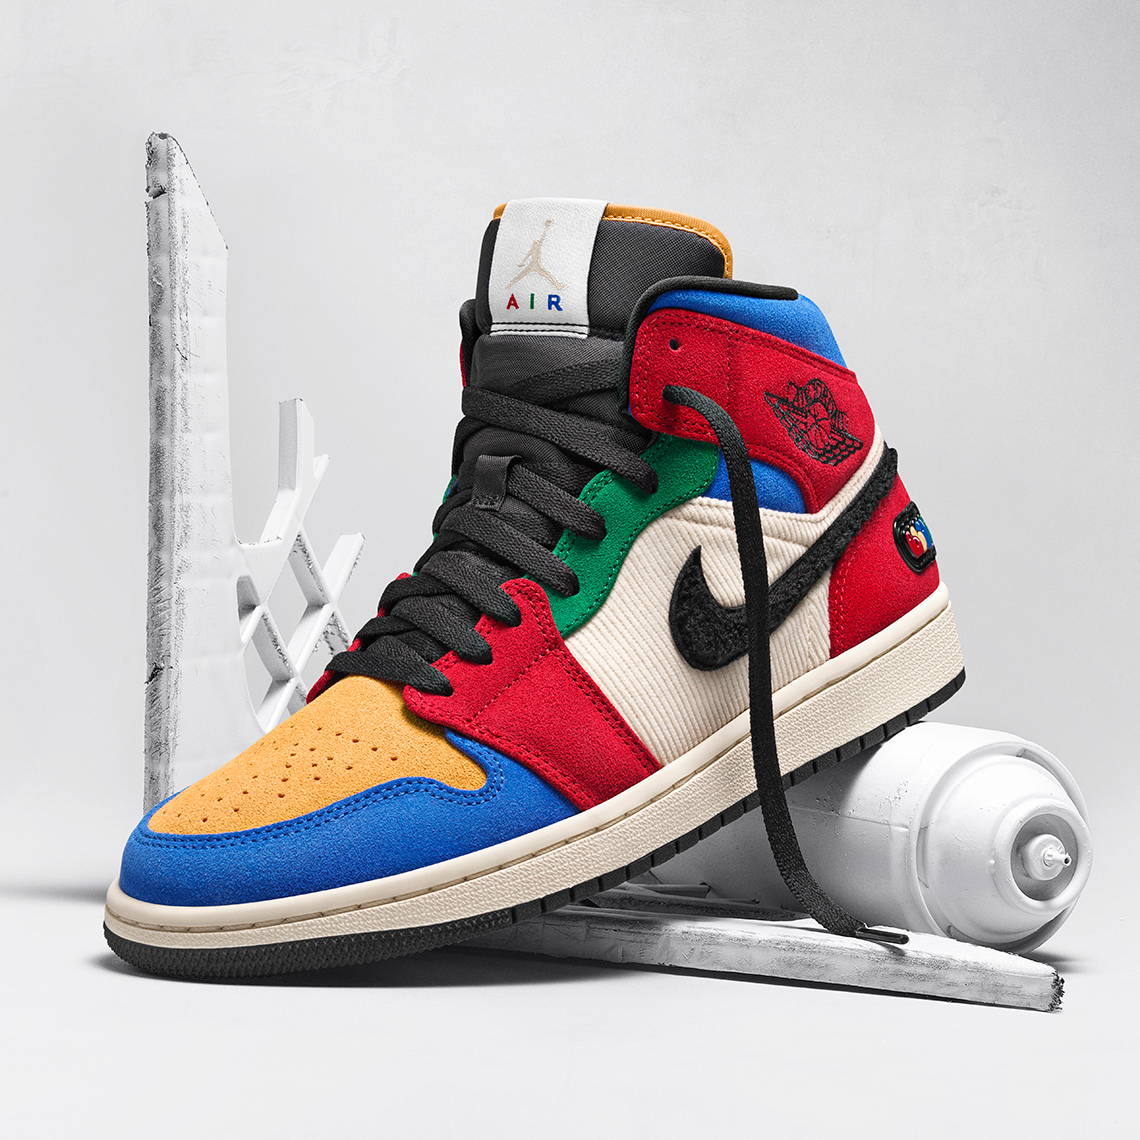 air-jordan-1-mid-fearless-blue-the-great-cu2805-100-release-date-sneakers-heat